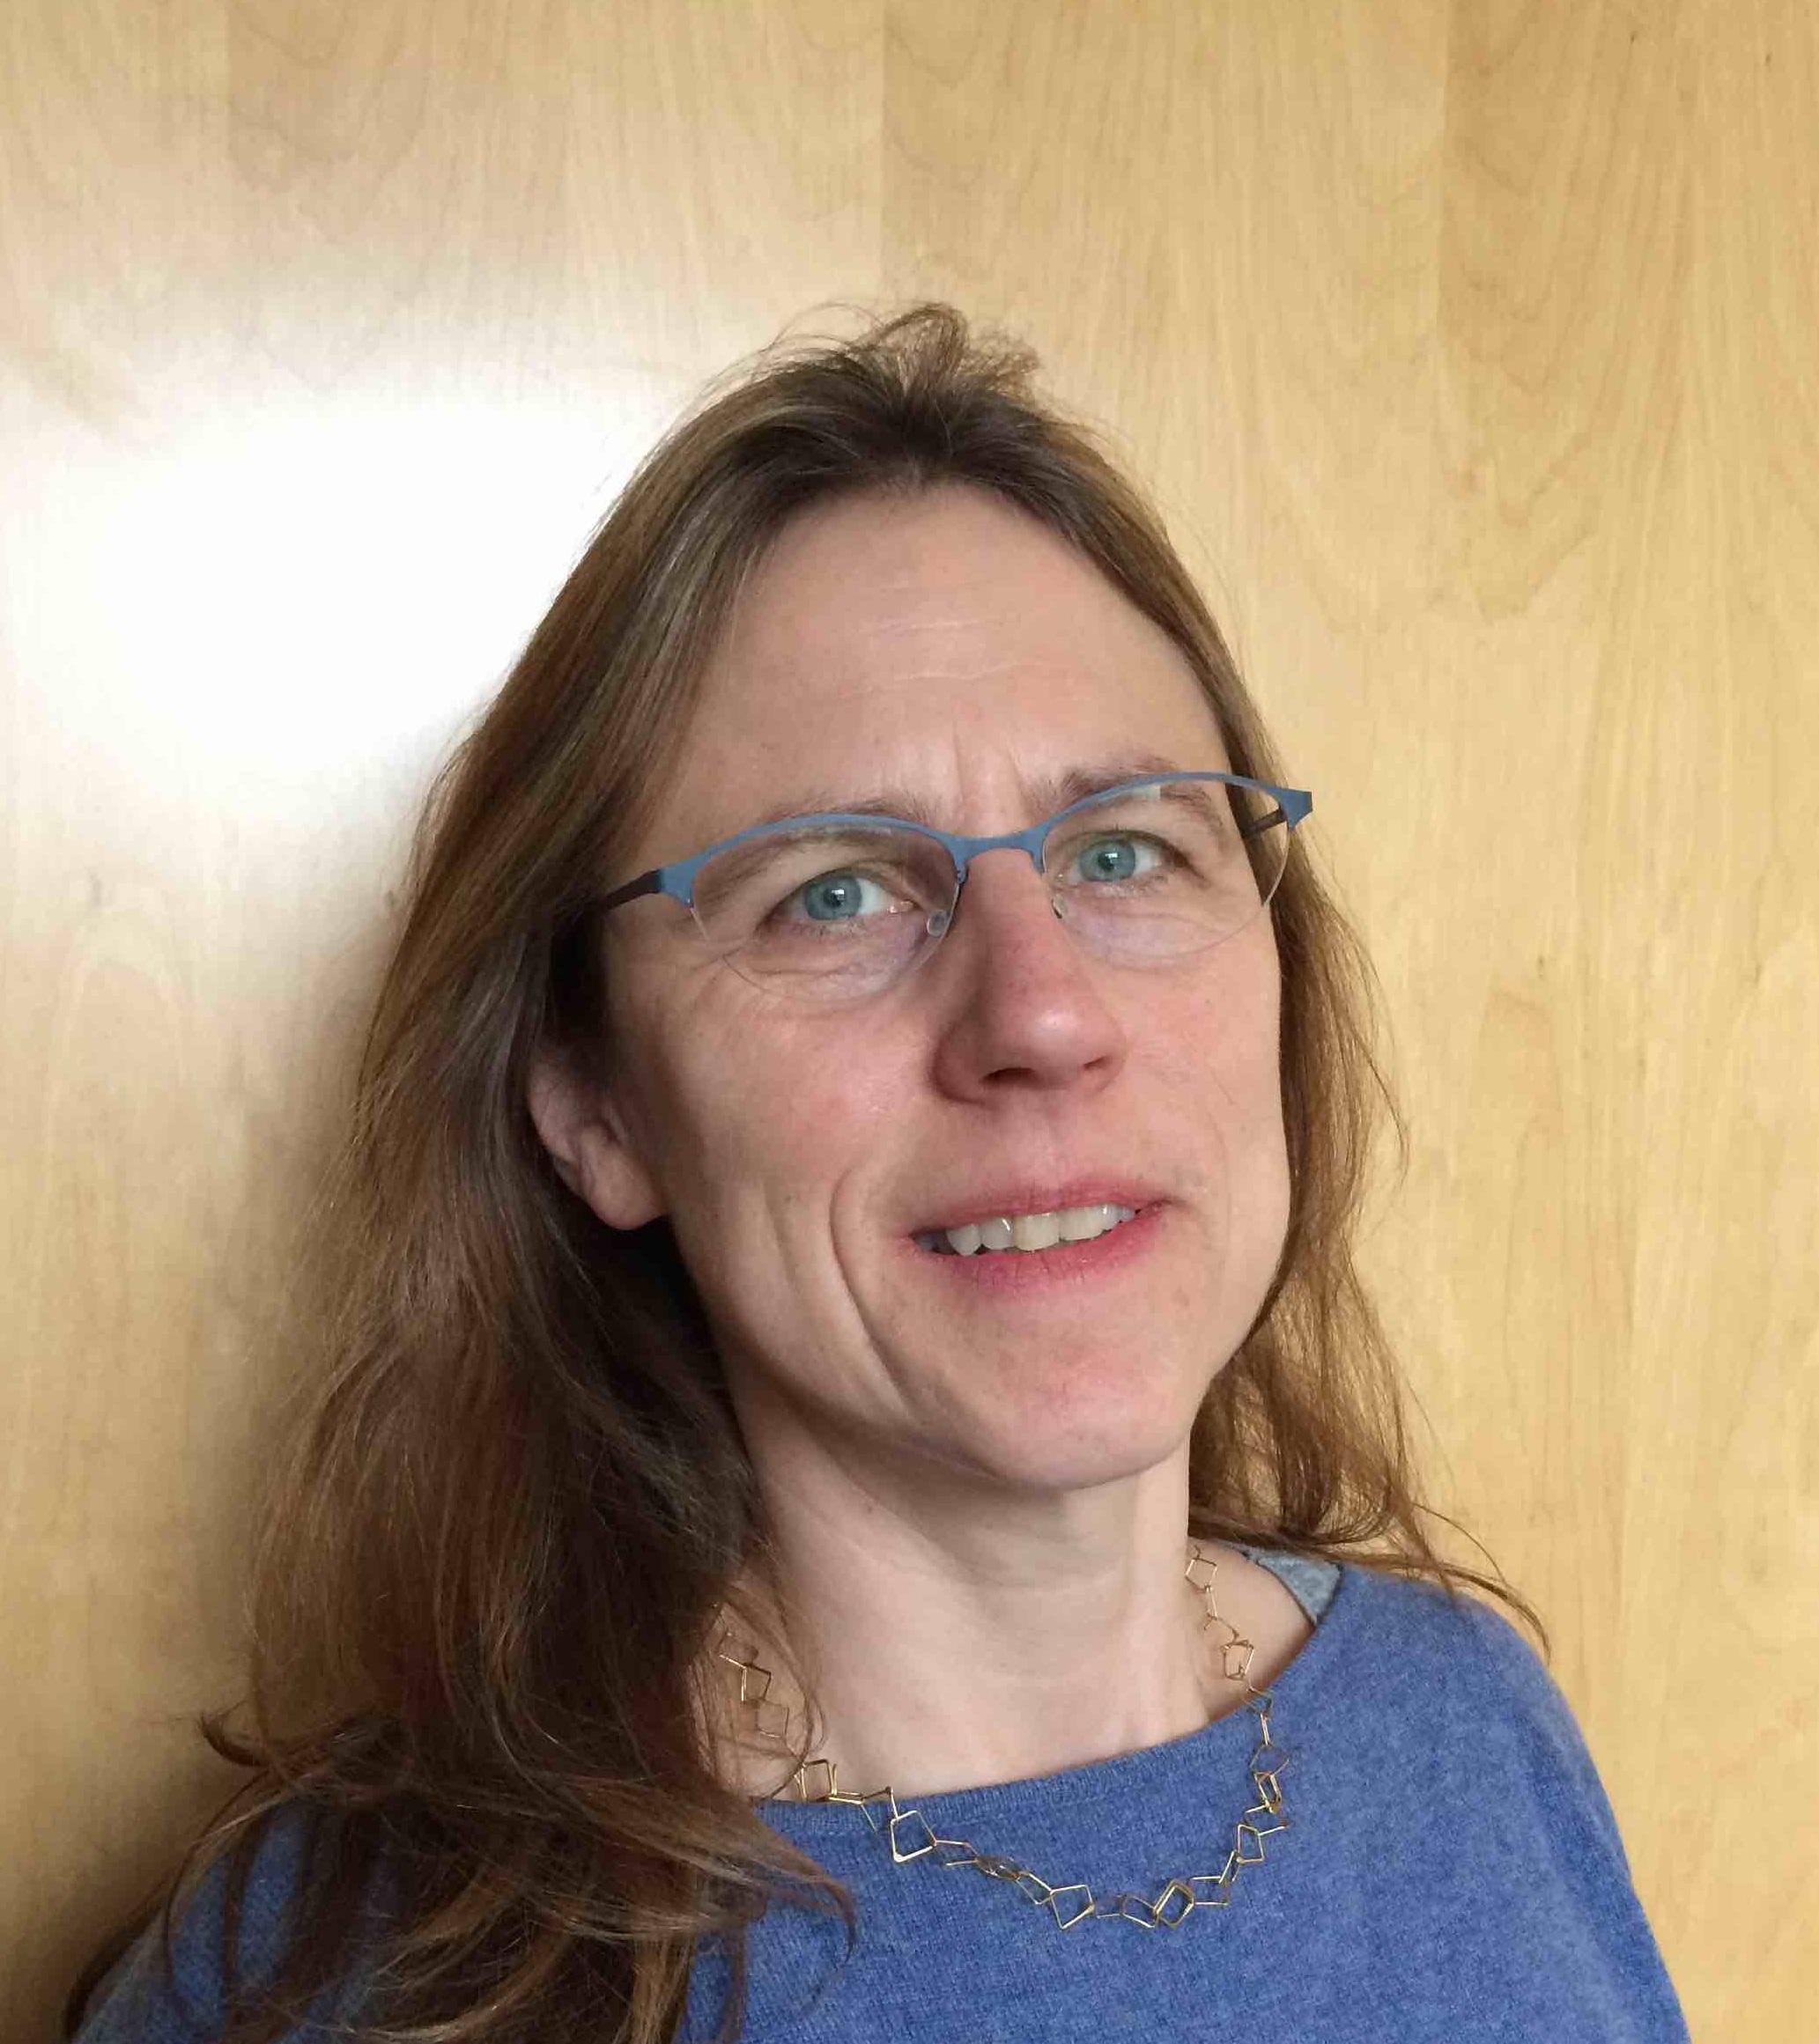 Charlotte Mathiassen